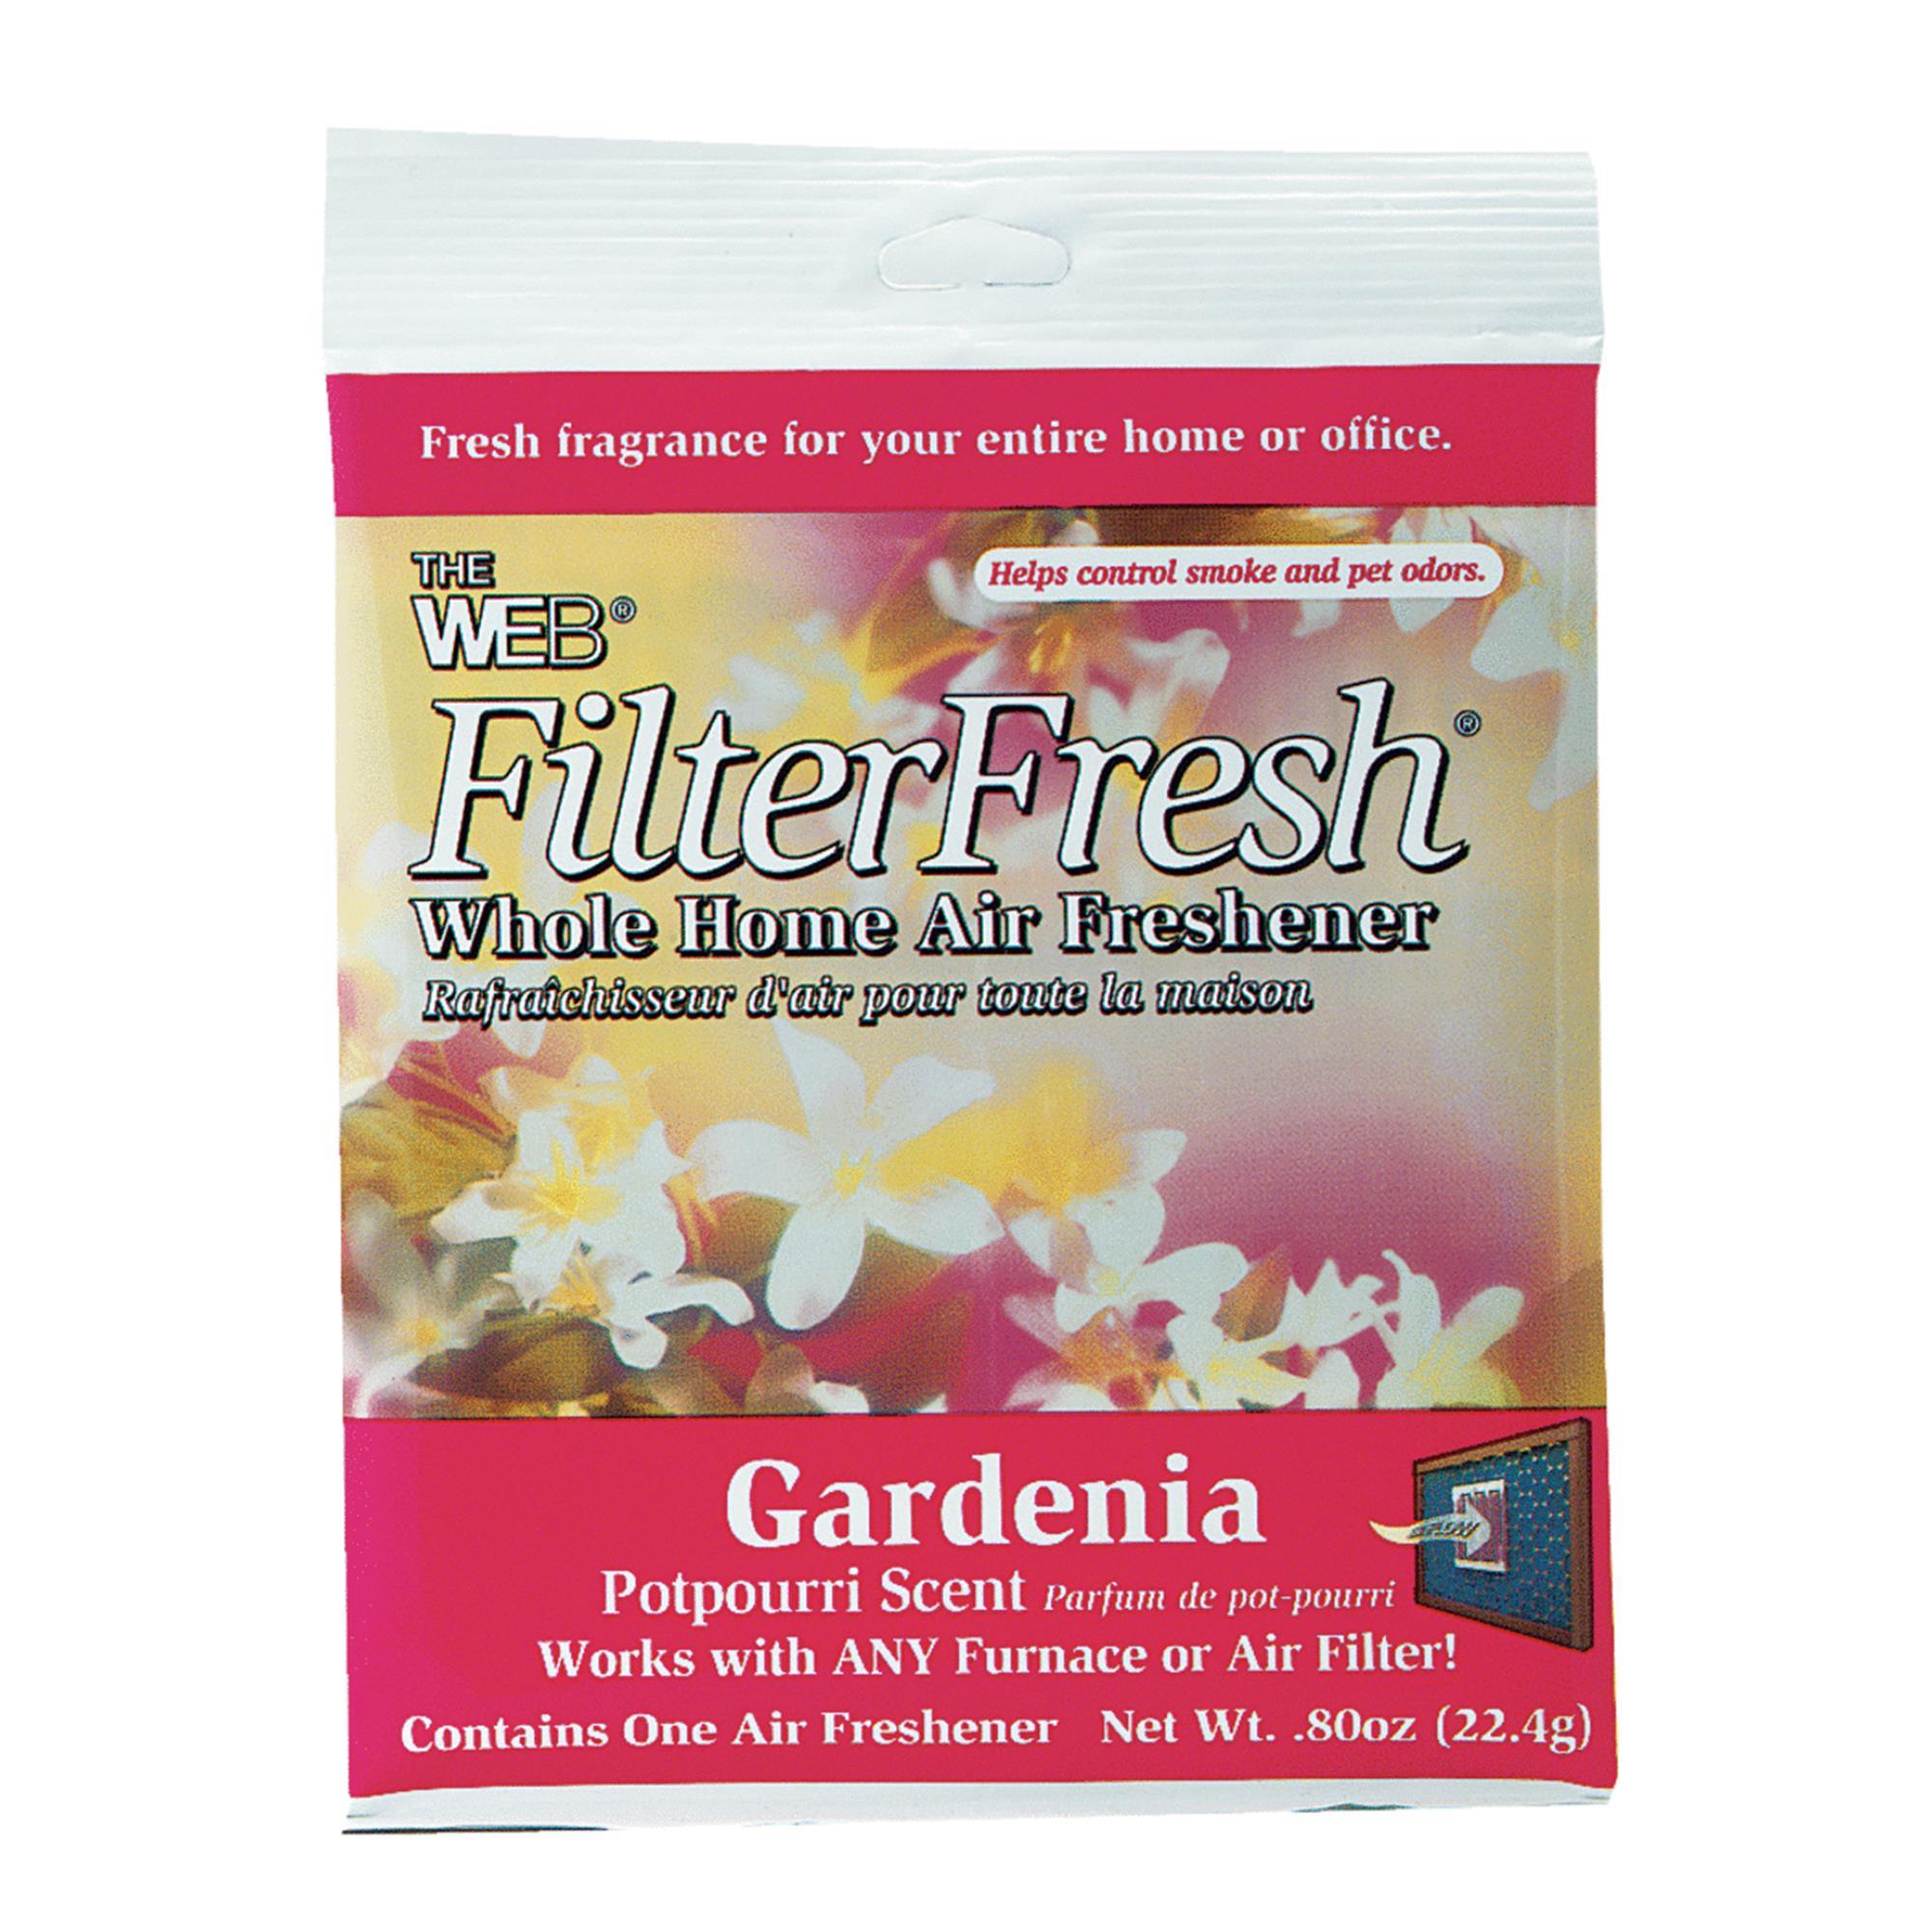 office air freshener. Office Air Freshener